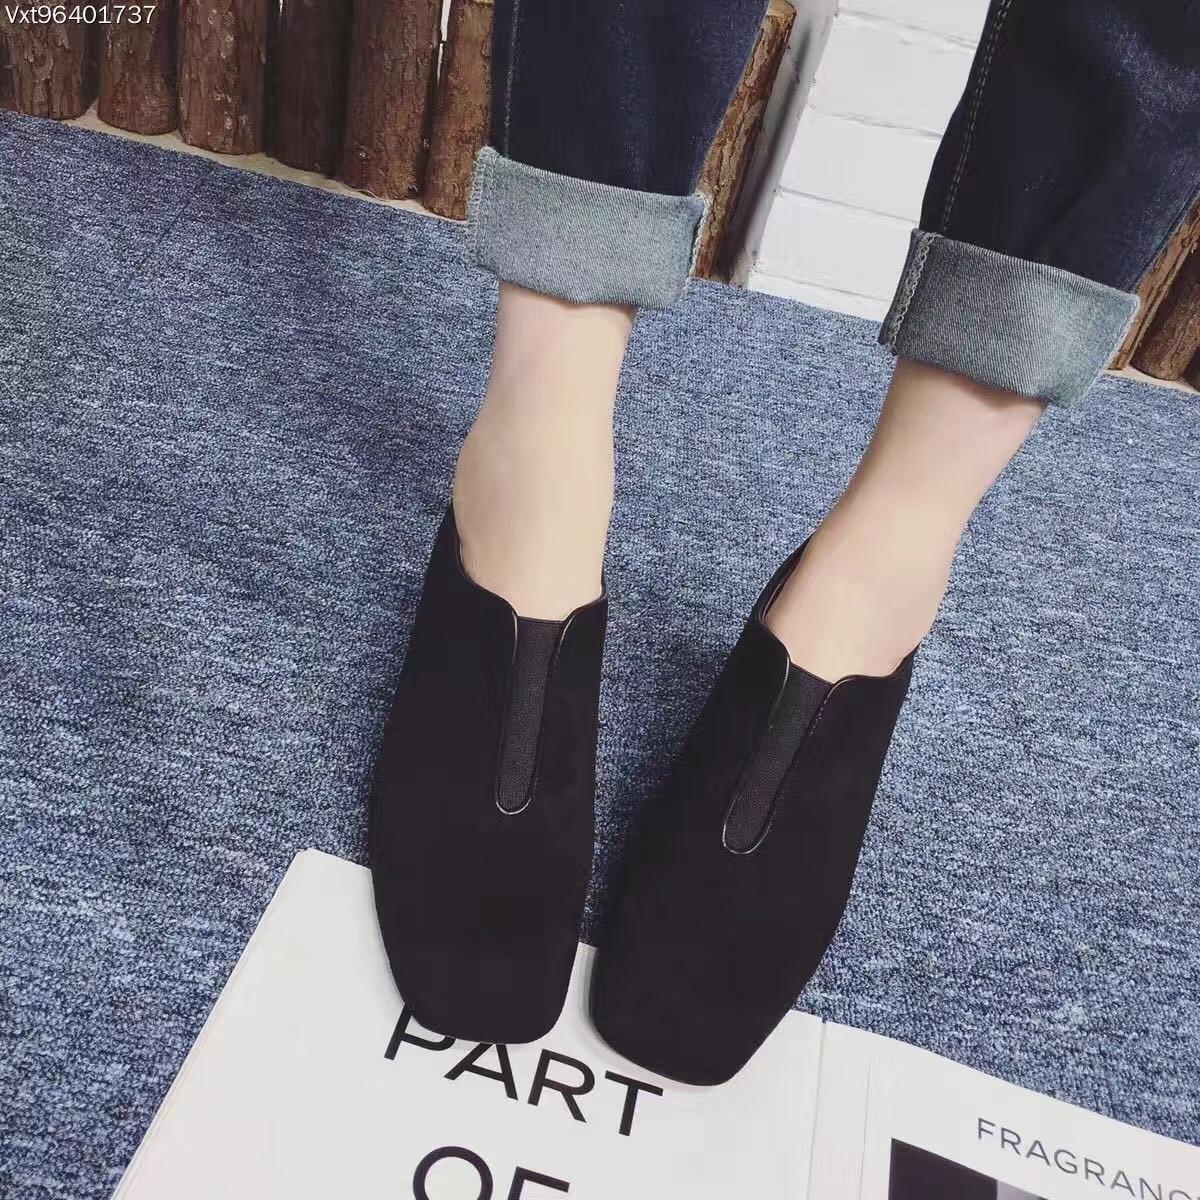 Black Khaki Women Shoes Winter High Heel Ankle Boots 7.5cm Suede Low Top Pumps<br><br>Aliexpress